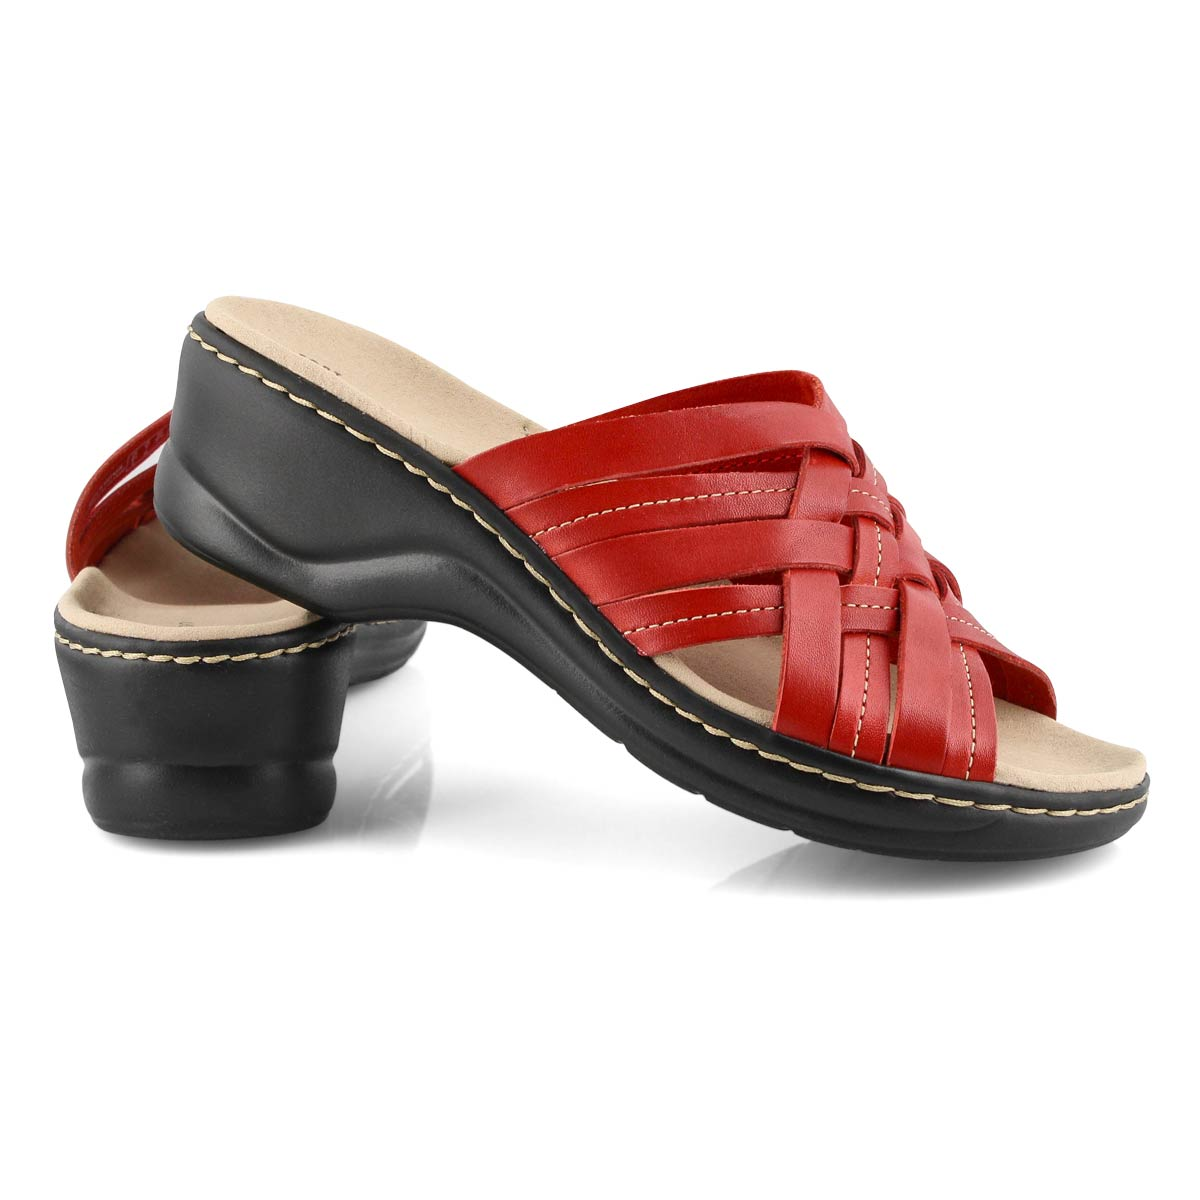 Lds Lexi Salina red slides -wide